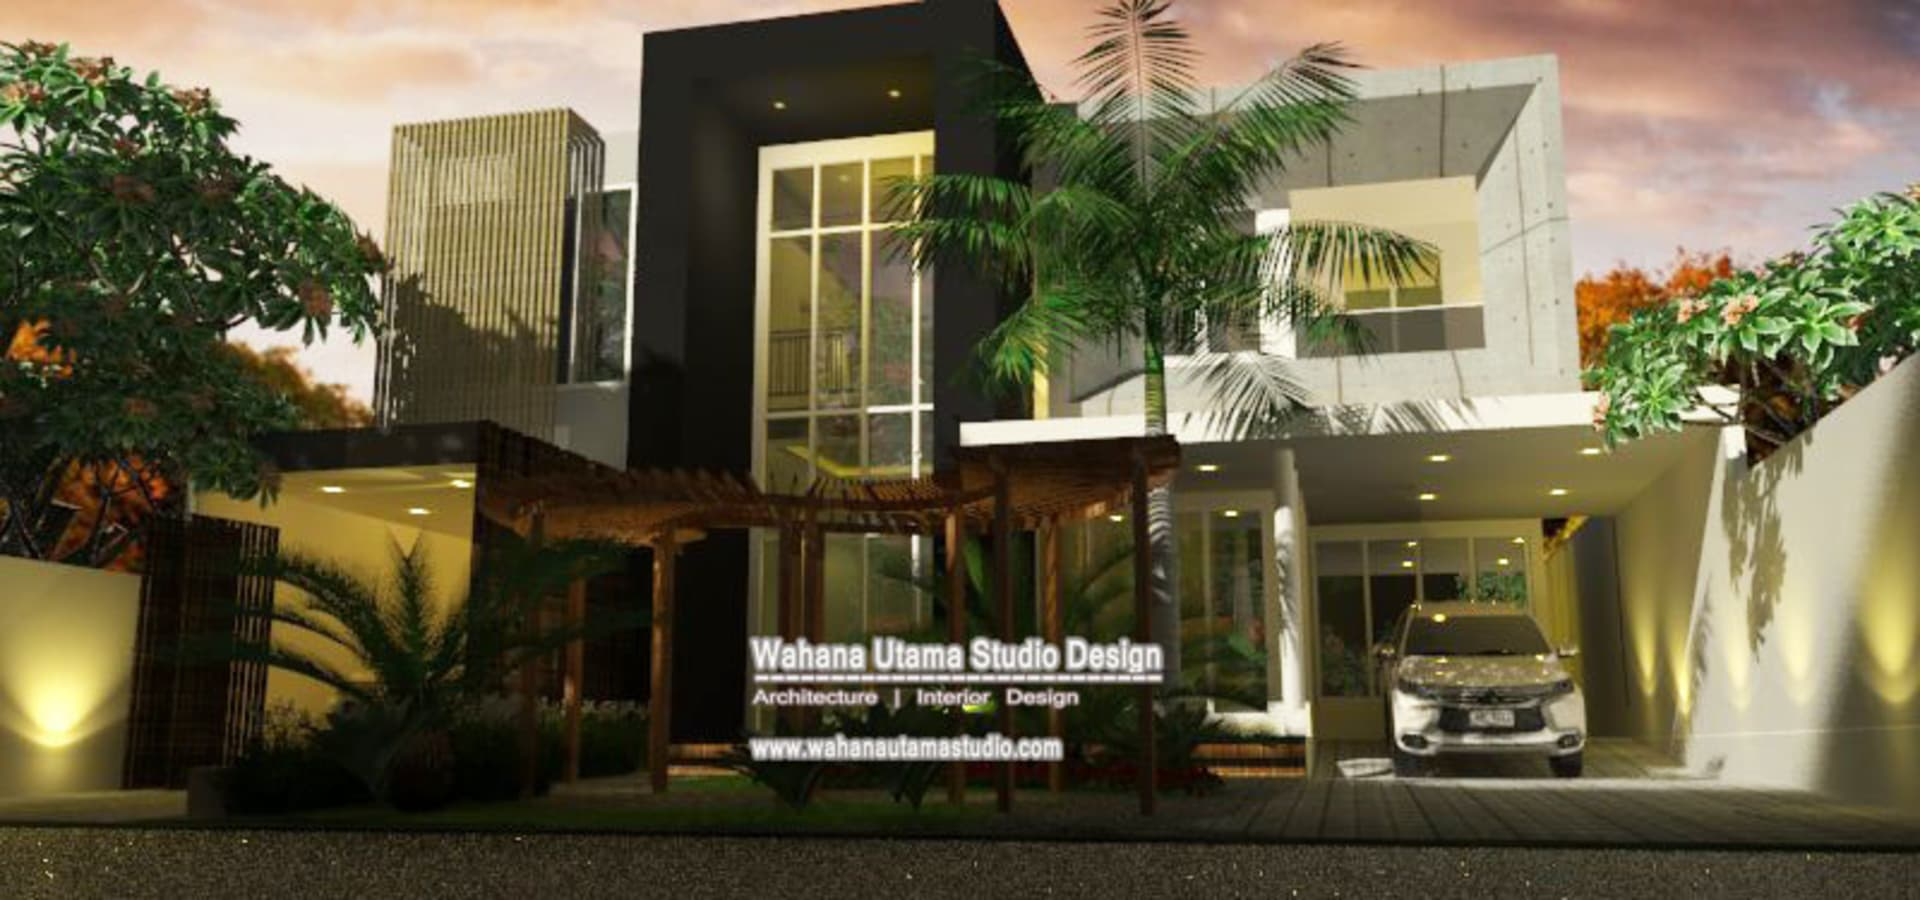 Wahana Utama Studio